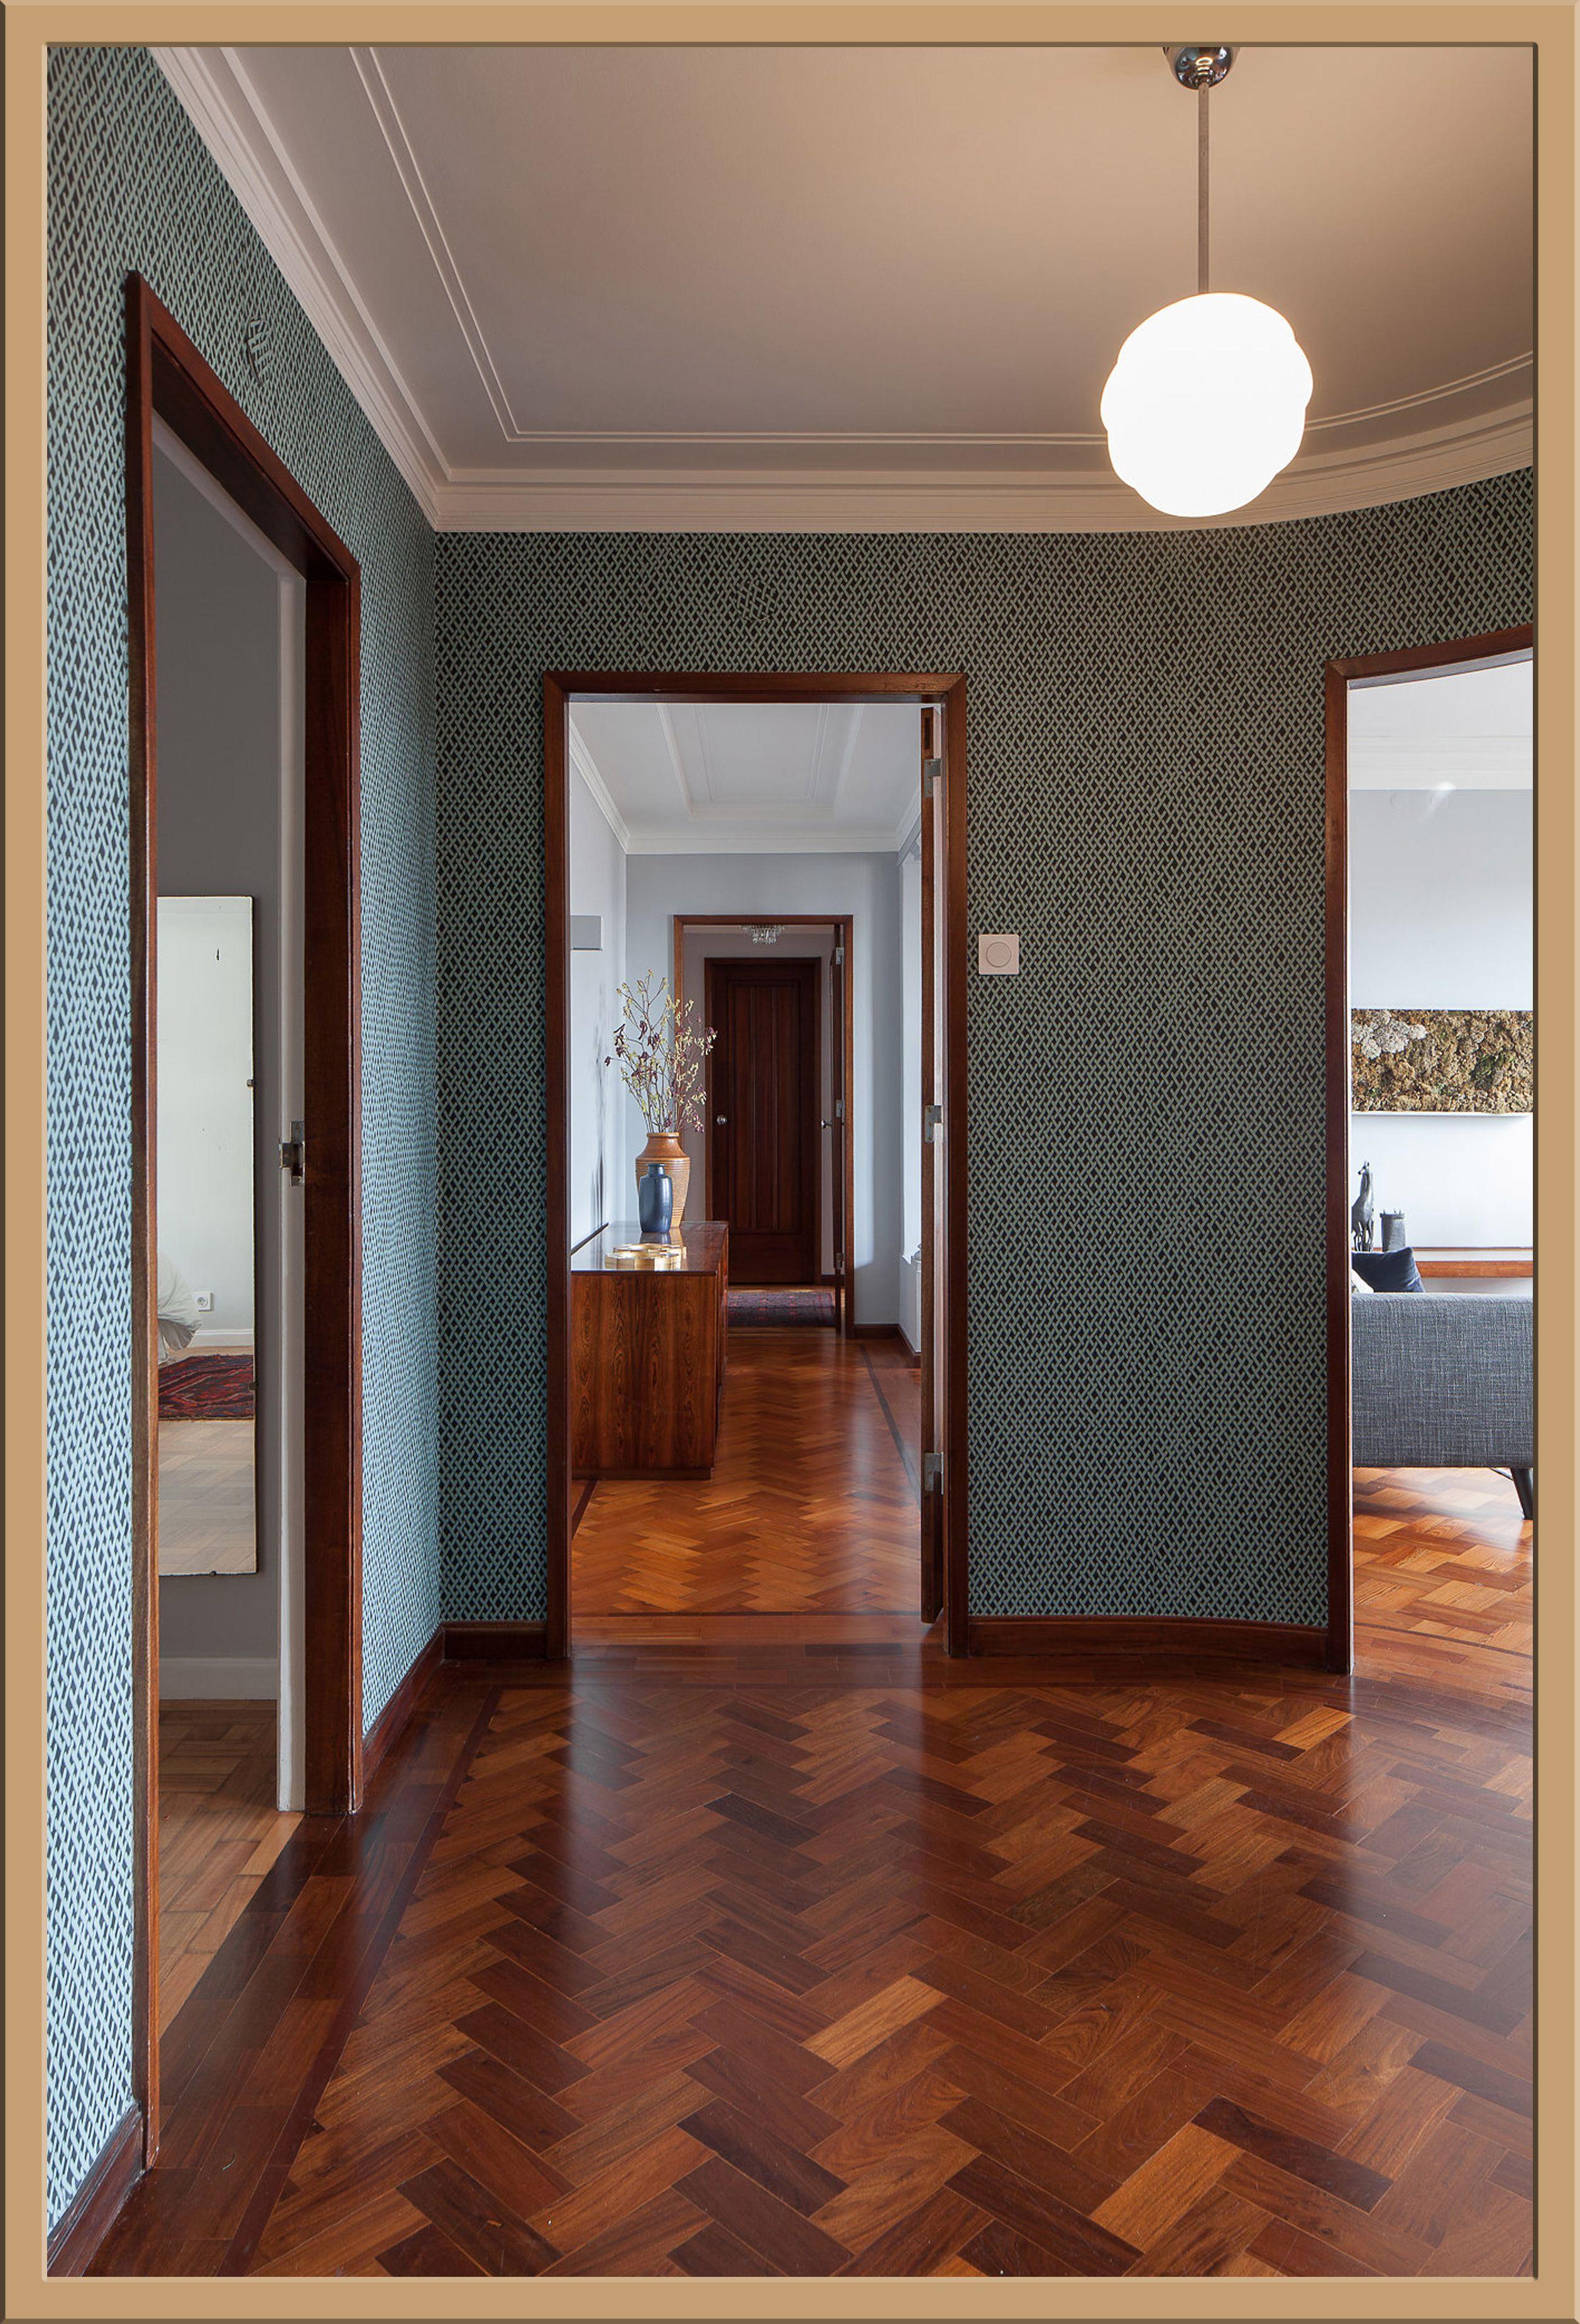 Interior Design For Money-Oct2020